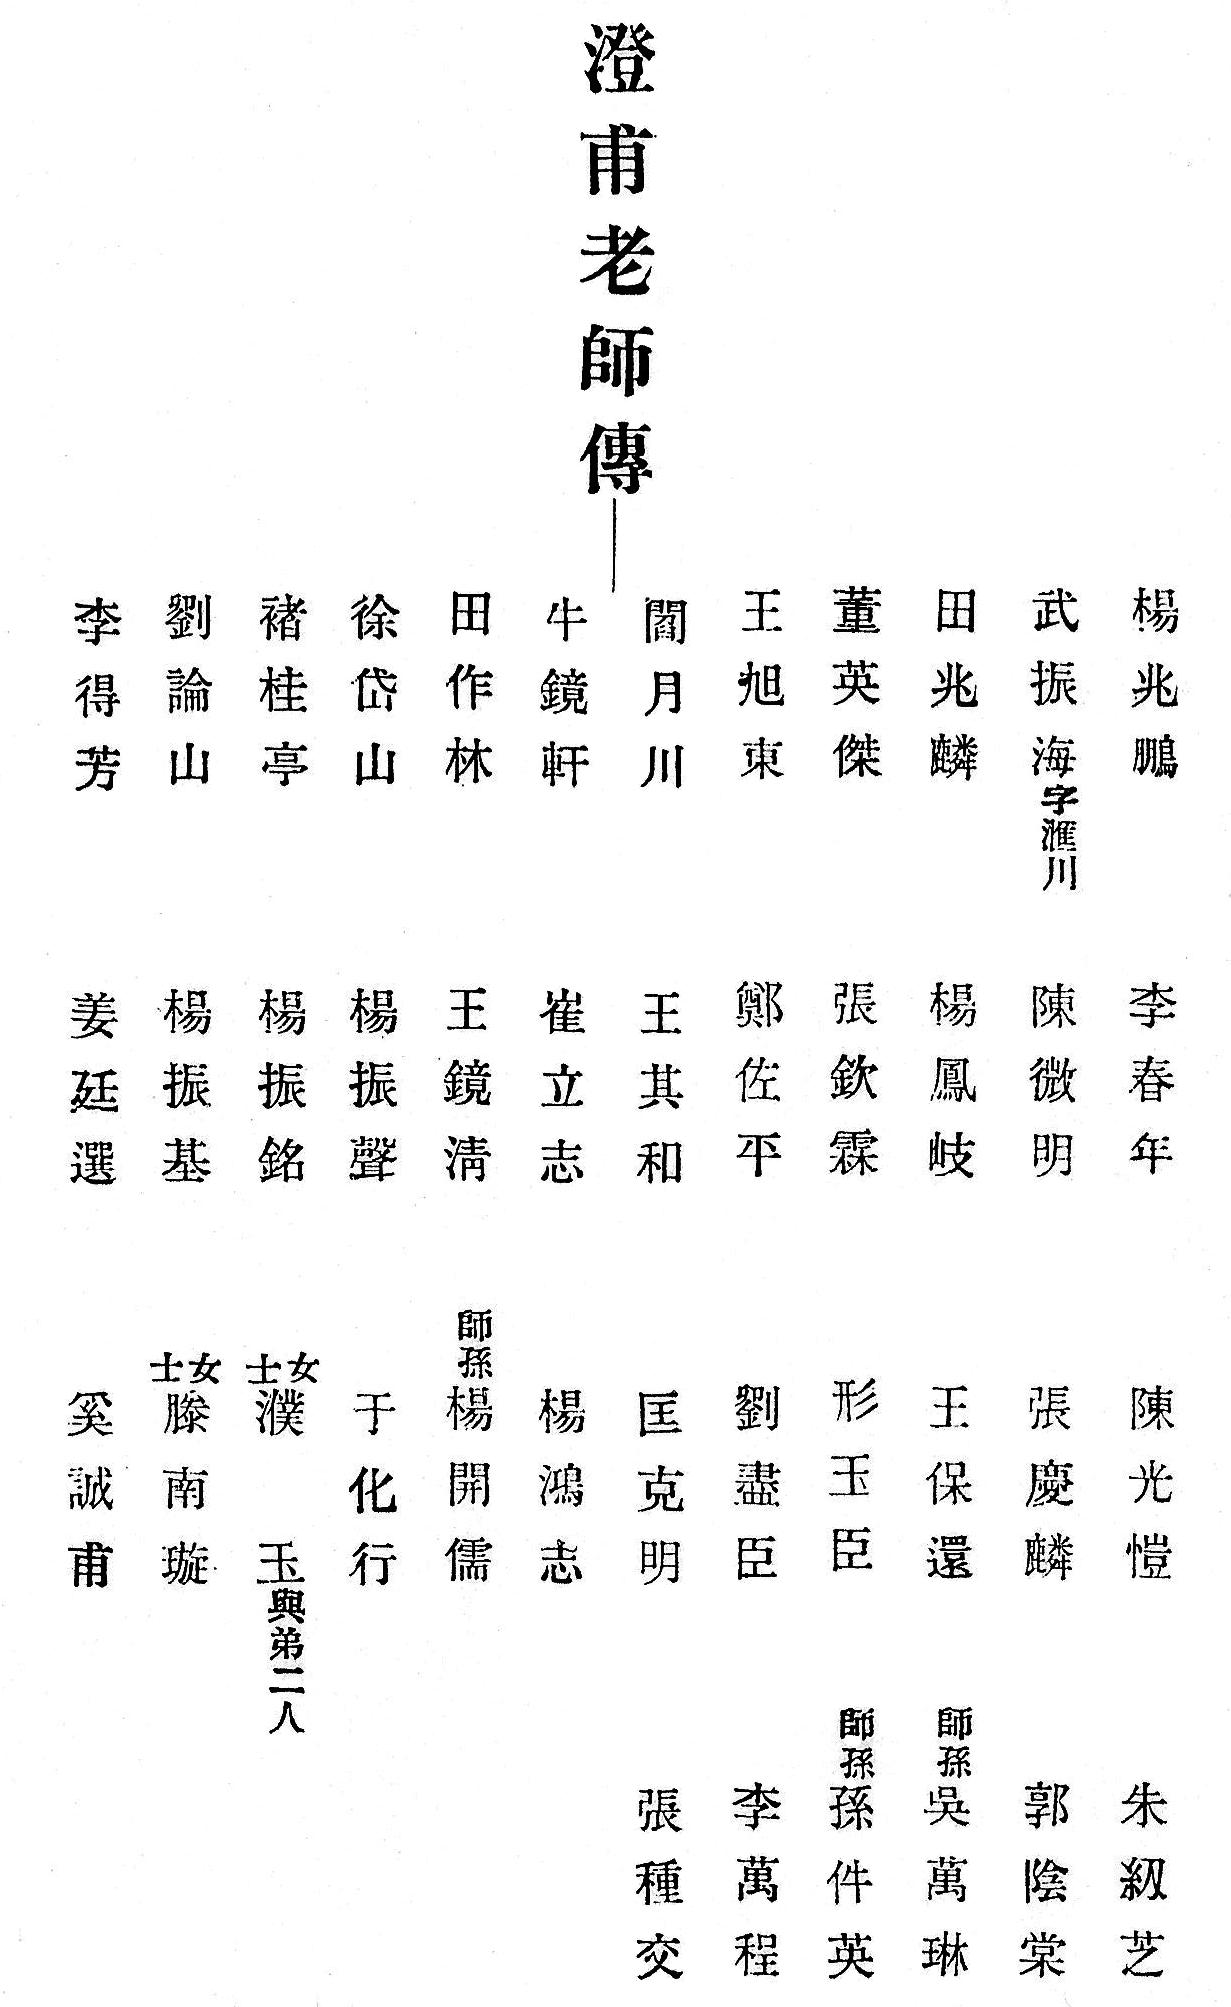 yang-chengfu-bog-lineage-s-2